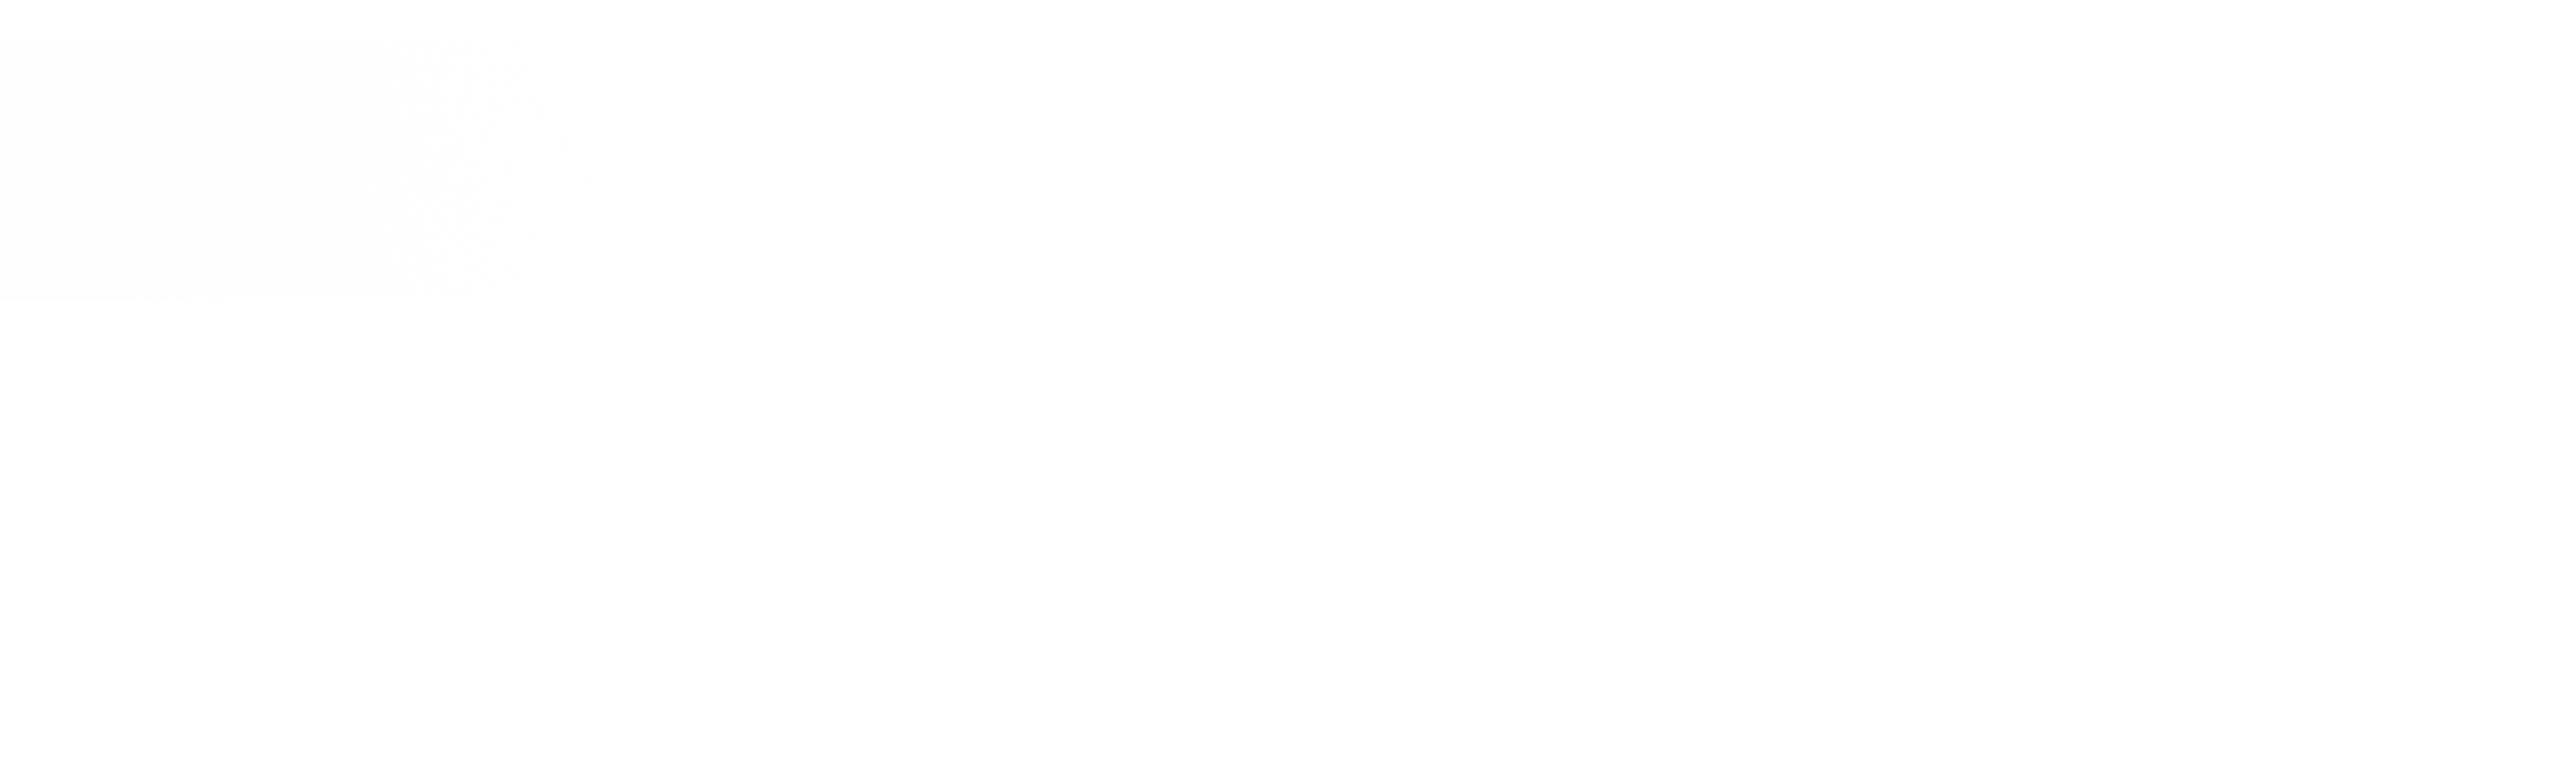 003 Slider Binde